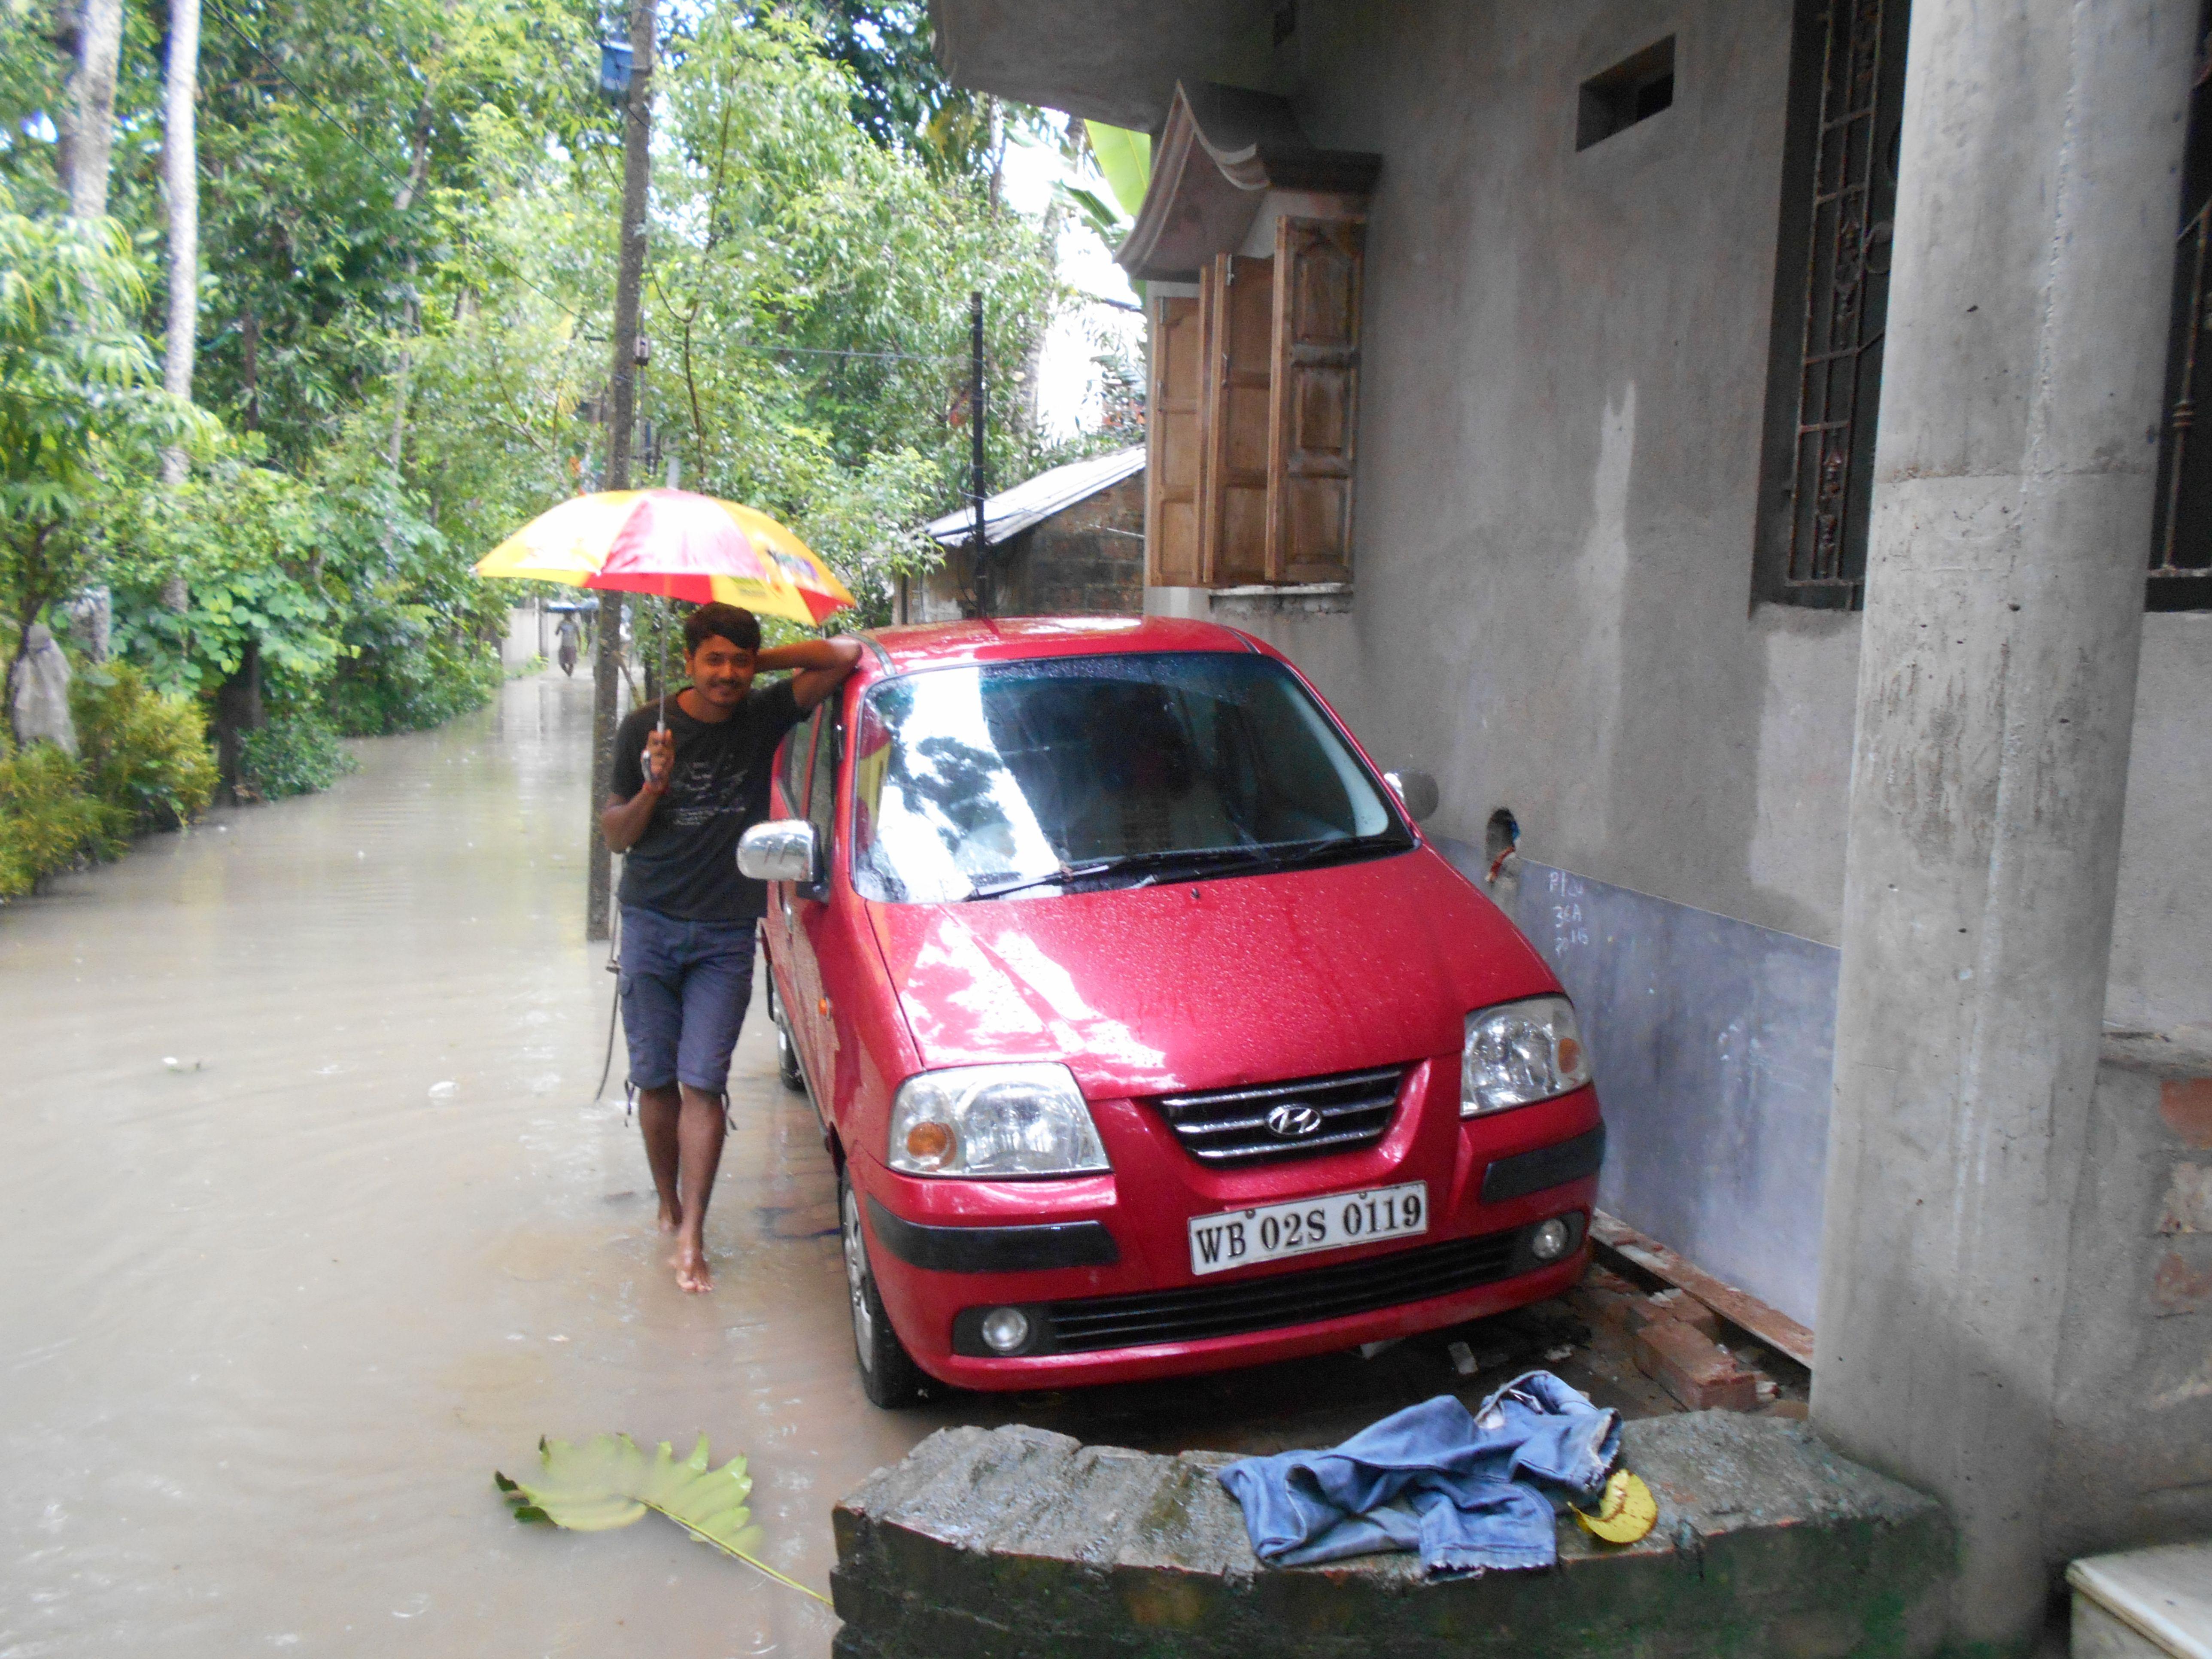 sushanta sarkar (With images) Car, Vehicles